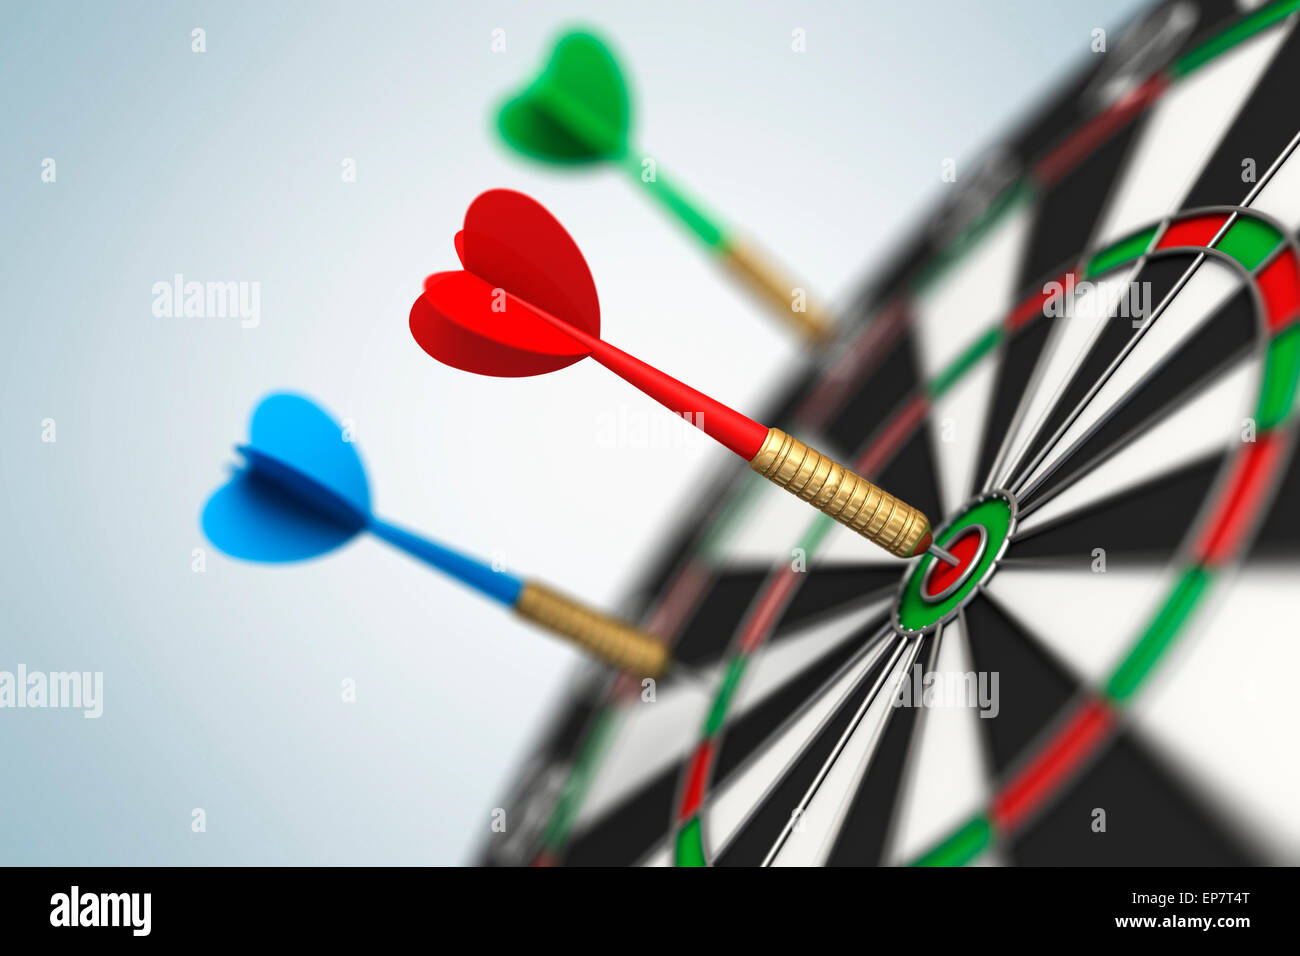 Darts arrow in bull's-eye - Stock Image